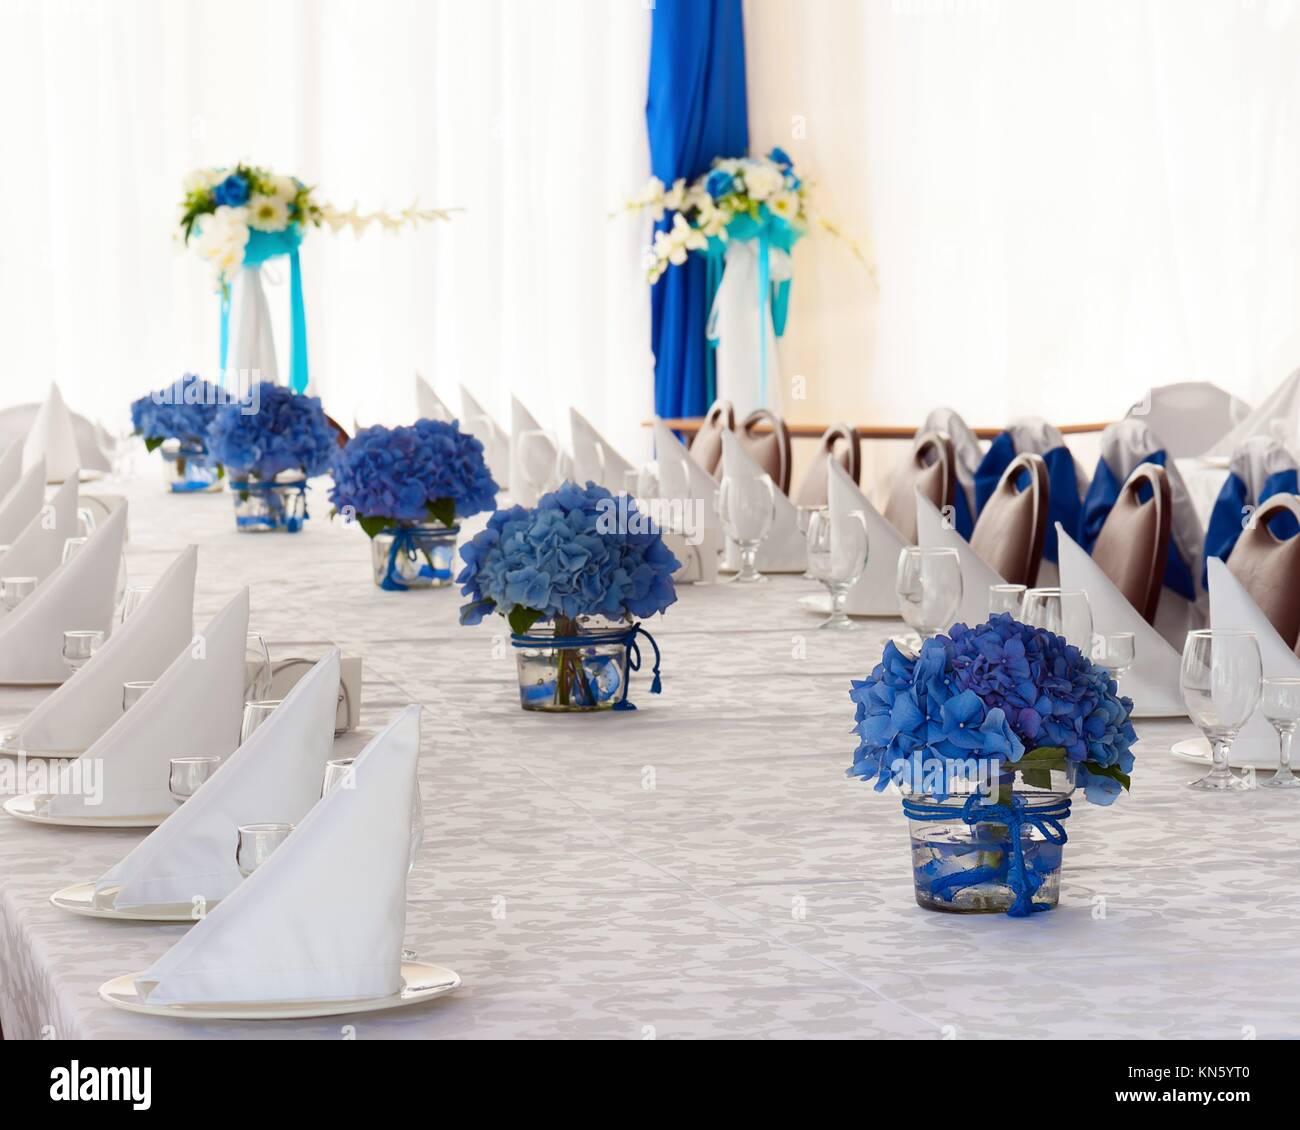 Hydrangea Flowers In Glass Vases Stockfotos Hydrangea Flowers In